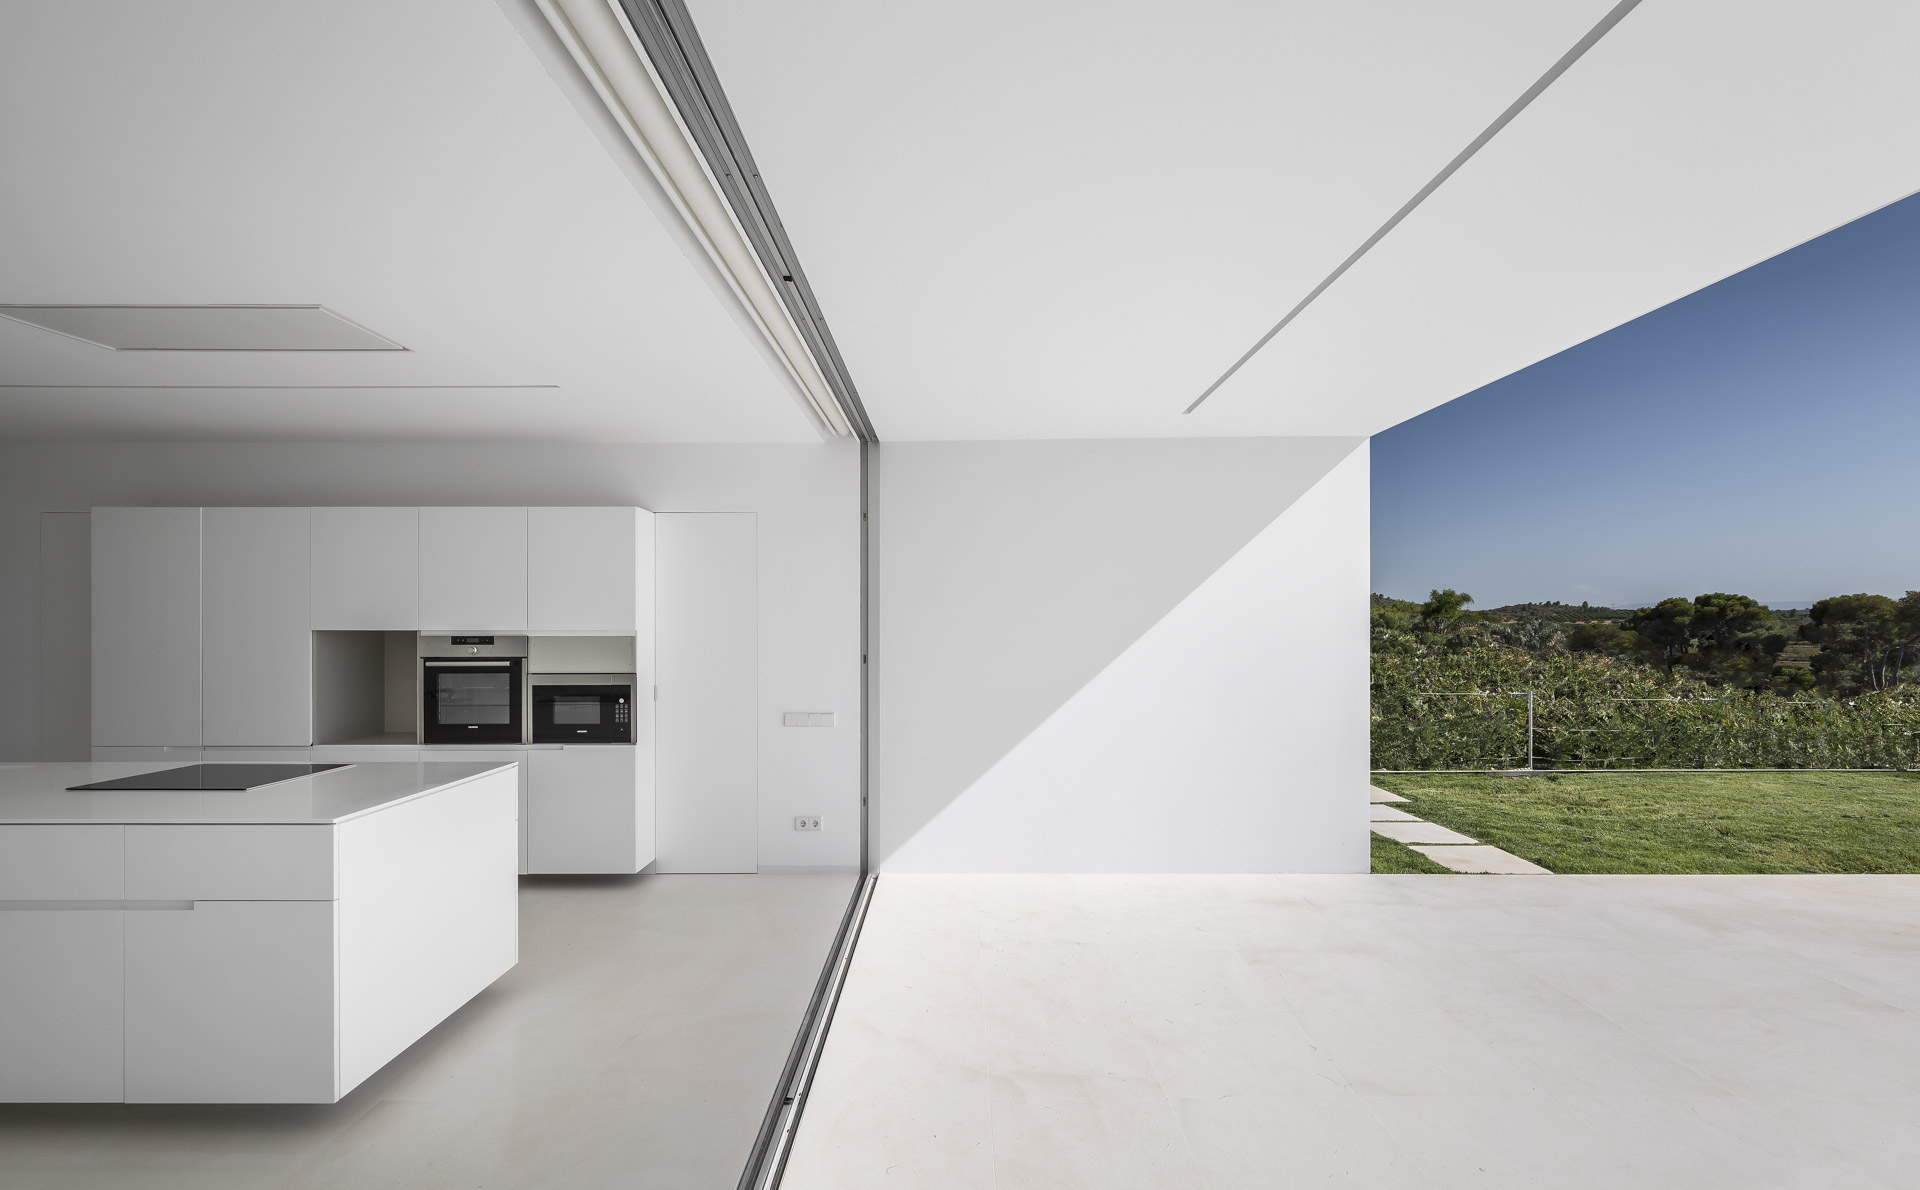 fotografia-arquitectura-valencia-german-cabo-gallardo-llopis-villamarchante-vivienda-21